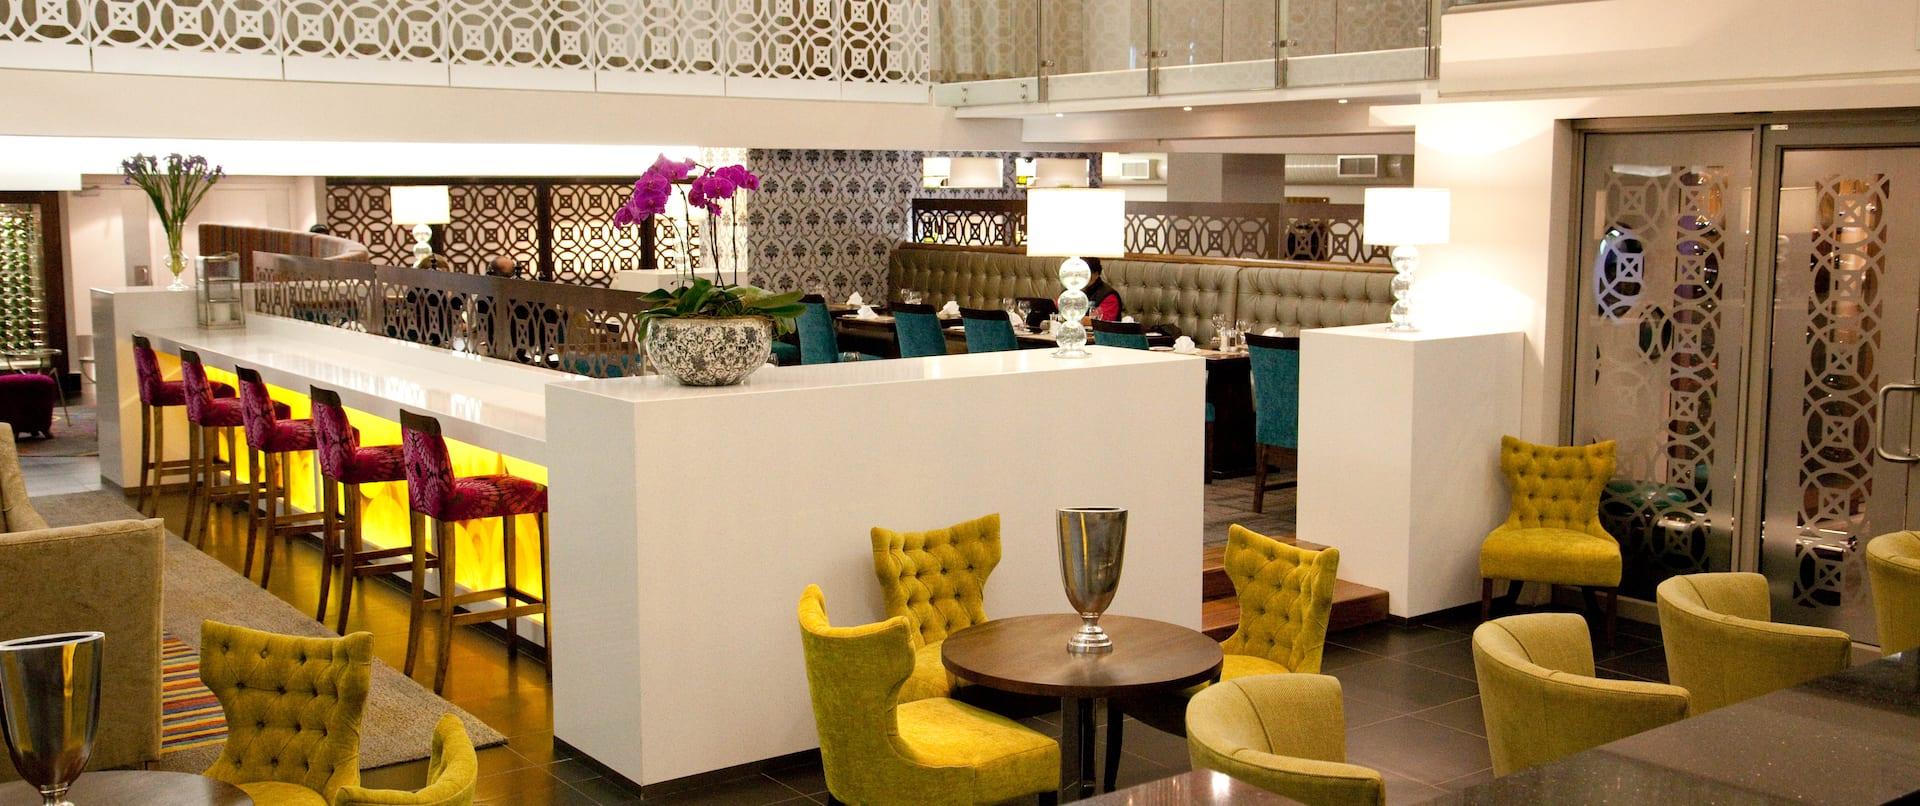 Liberty's Restaurant & Bar